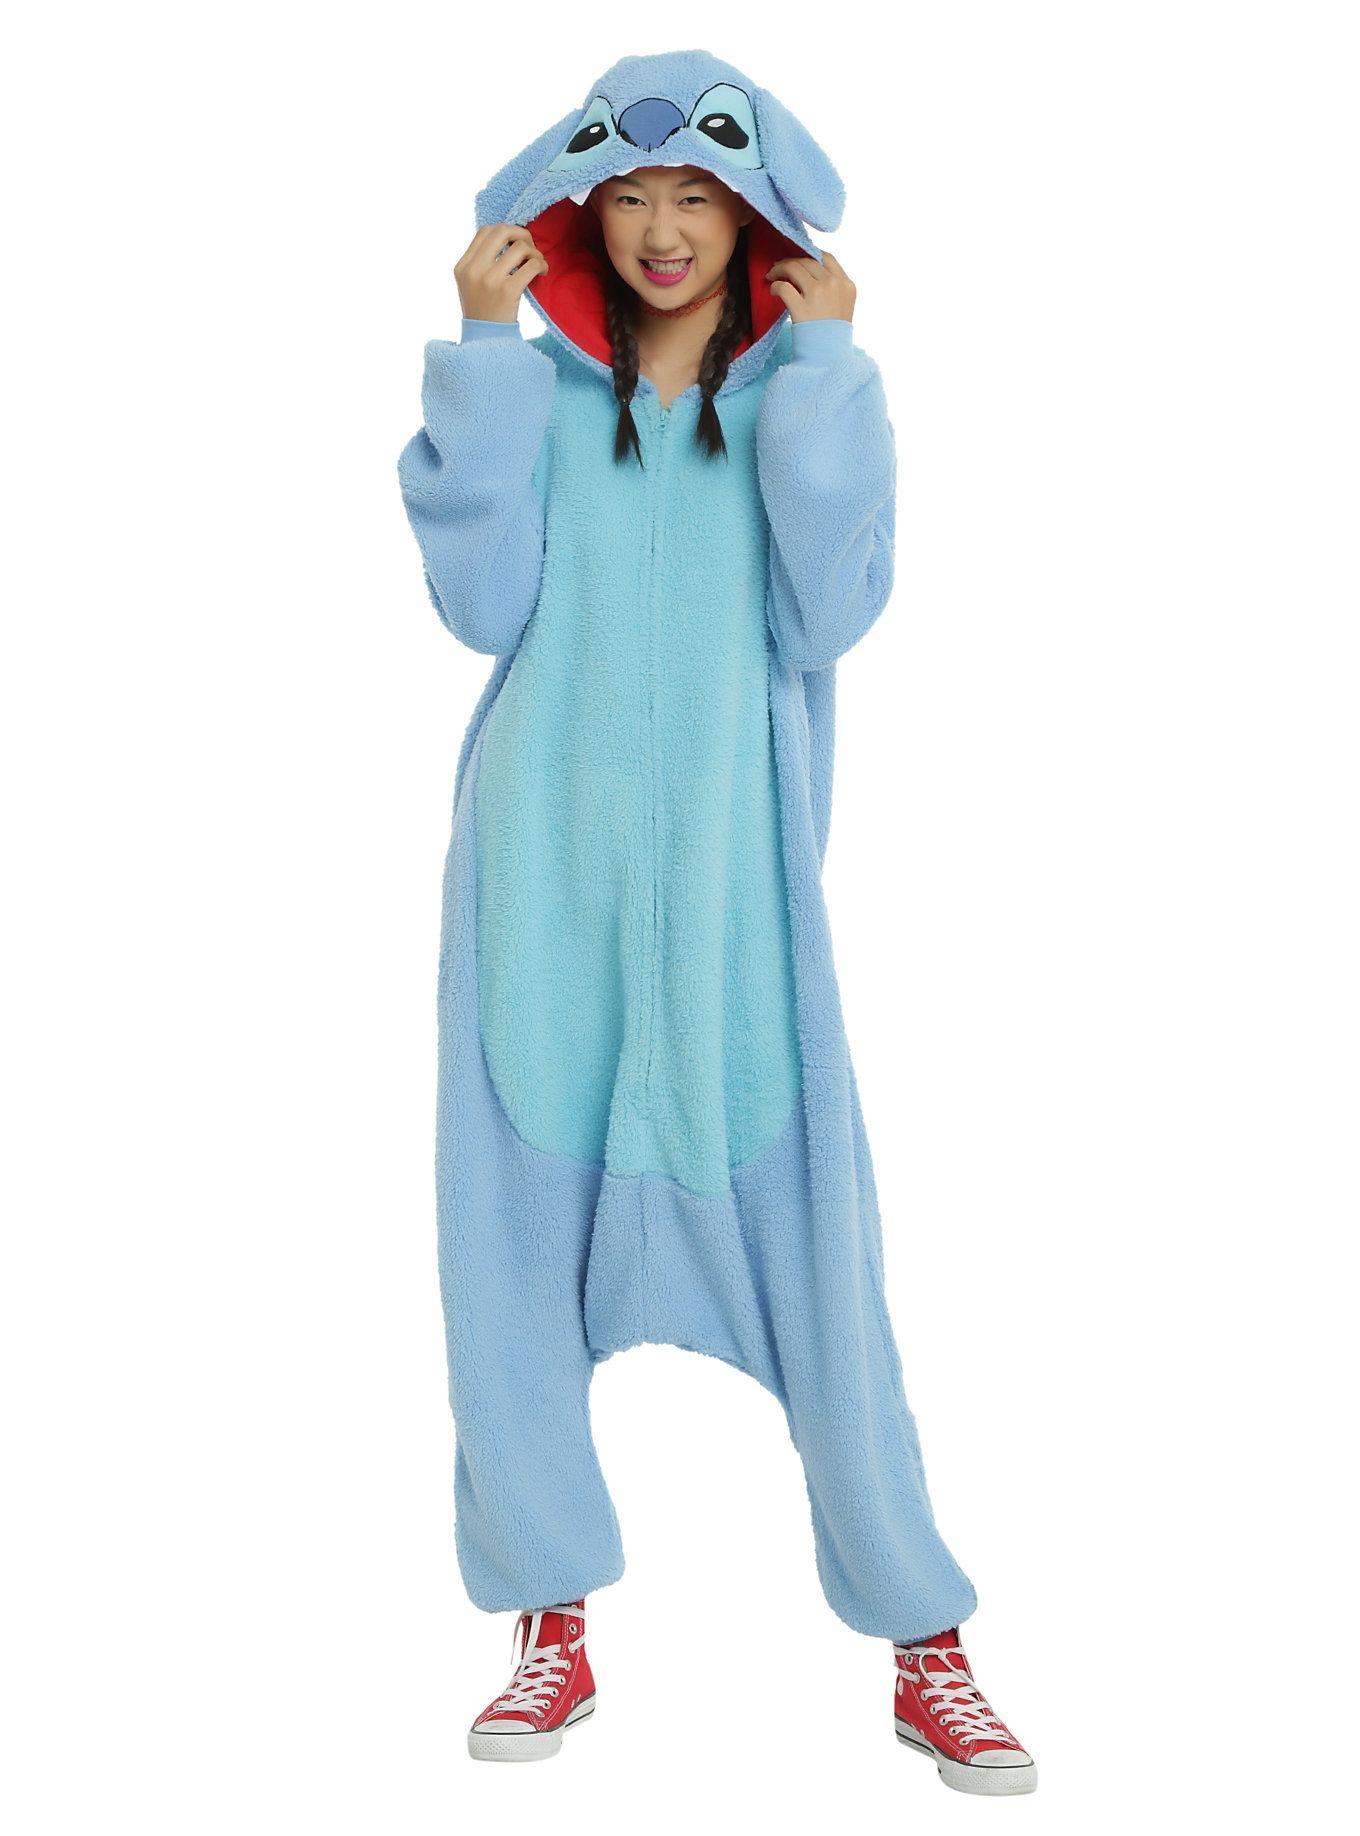 7c5f65a9eb3f As PJs or a costume - get Stitched! // Disney Lilo Stitch Union Suit